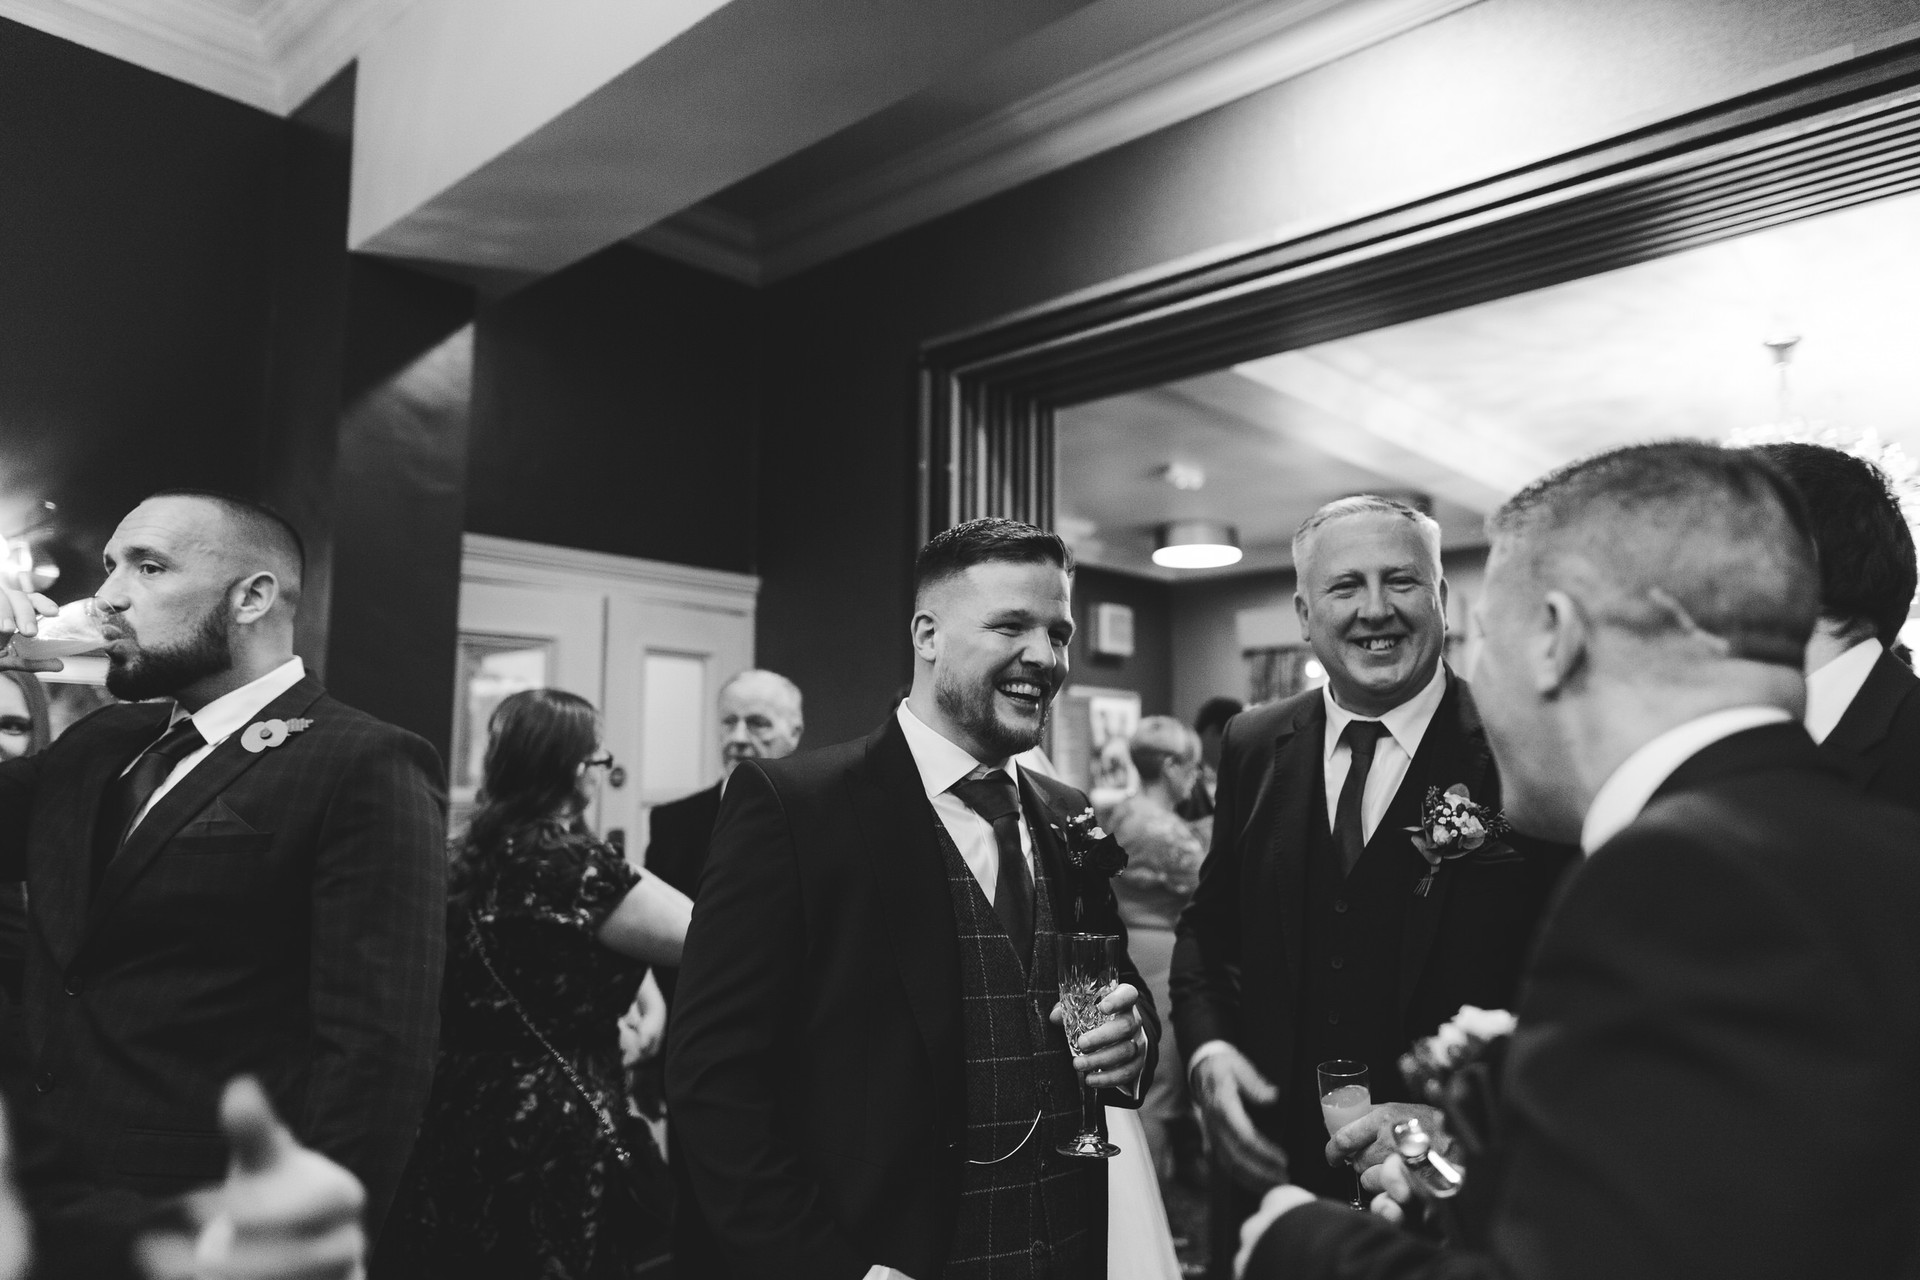 ilkley-west-yorkshire-wedding-135.jpg